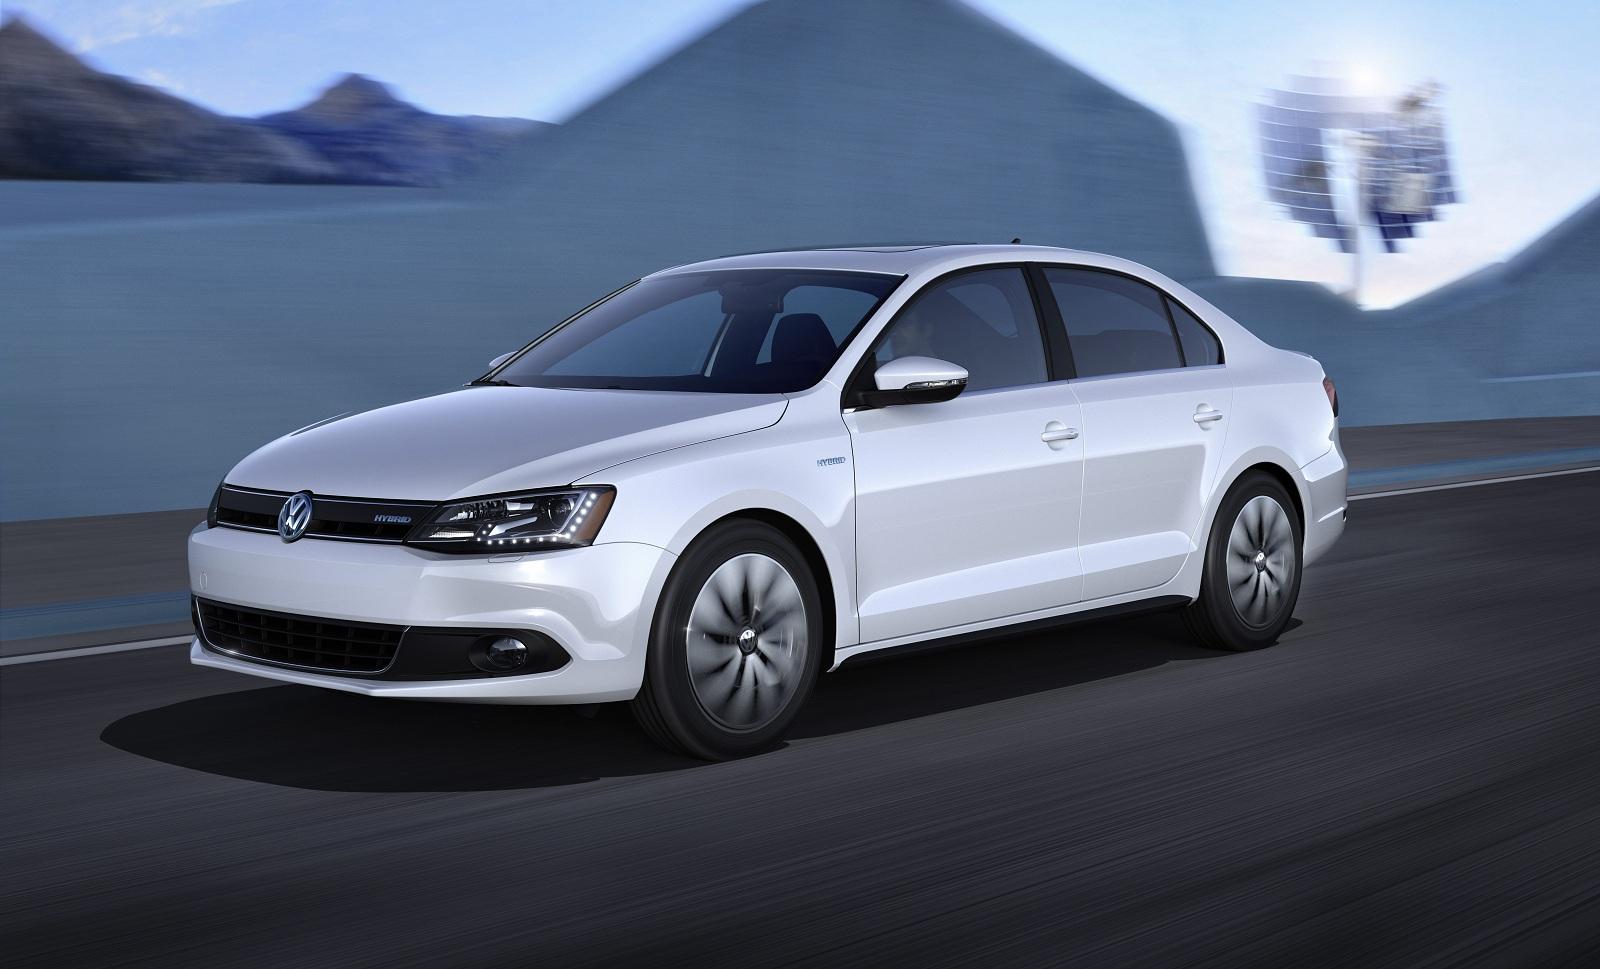 More VW court misery: Jetta Hybrid braking suit won't be